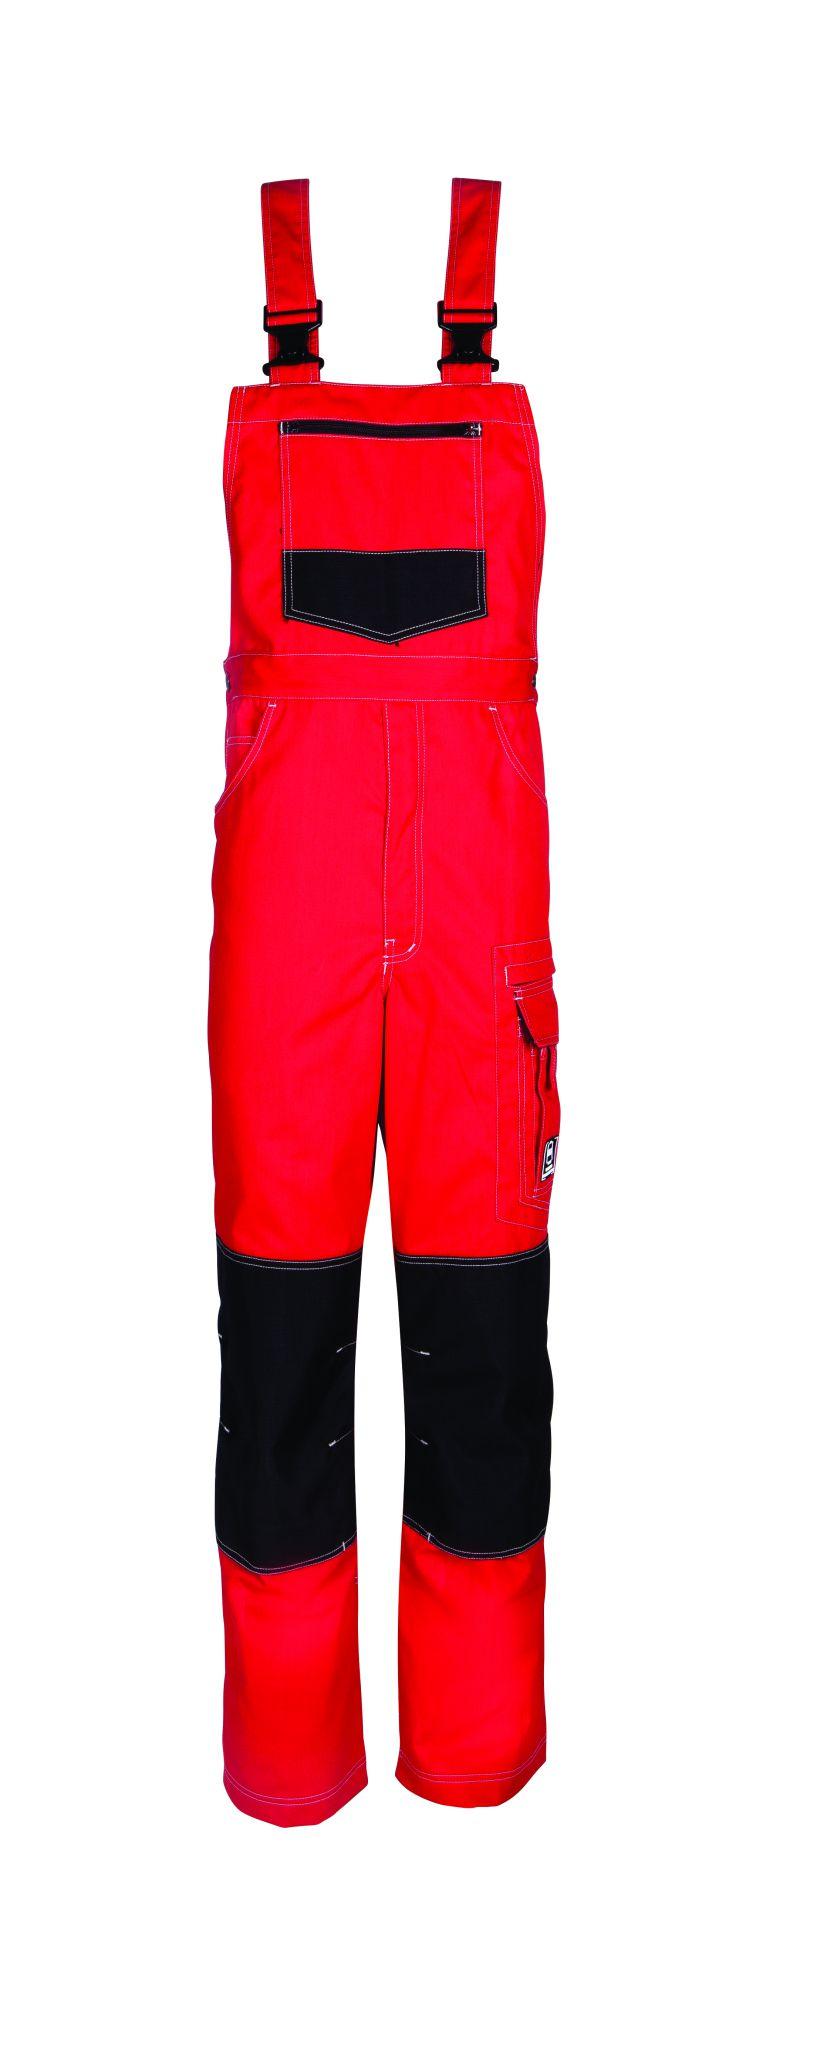 HaVeP Workwear/Protective wear Amerikaanse overall/Bretelbroek 20103